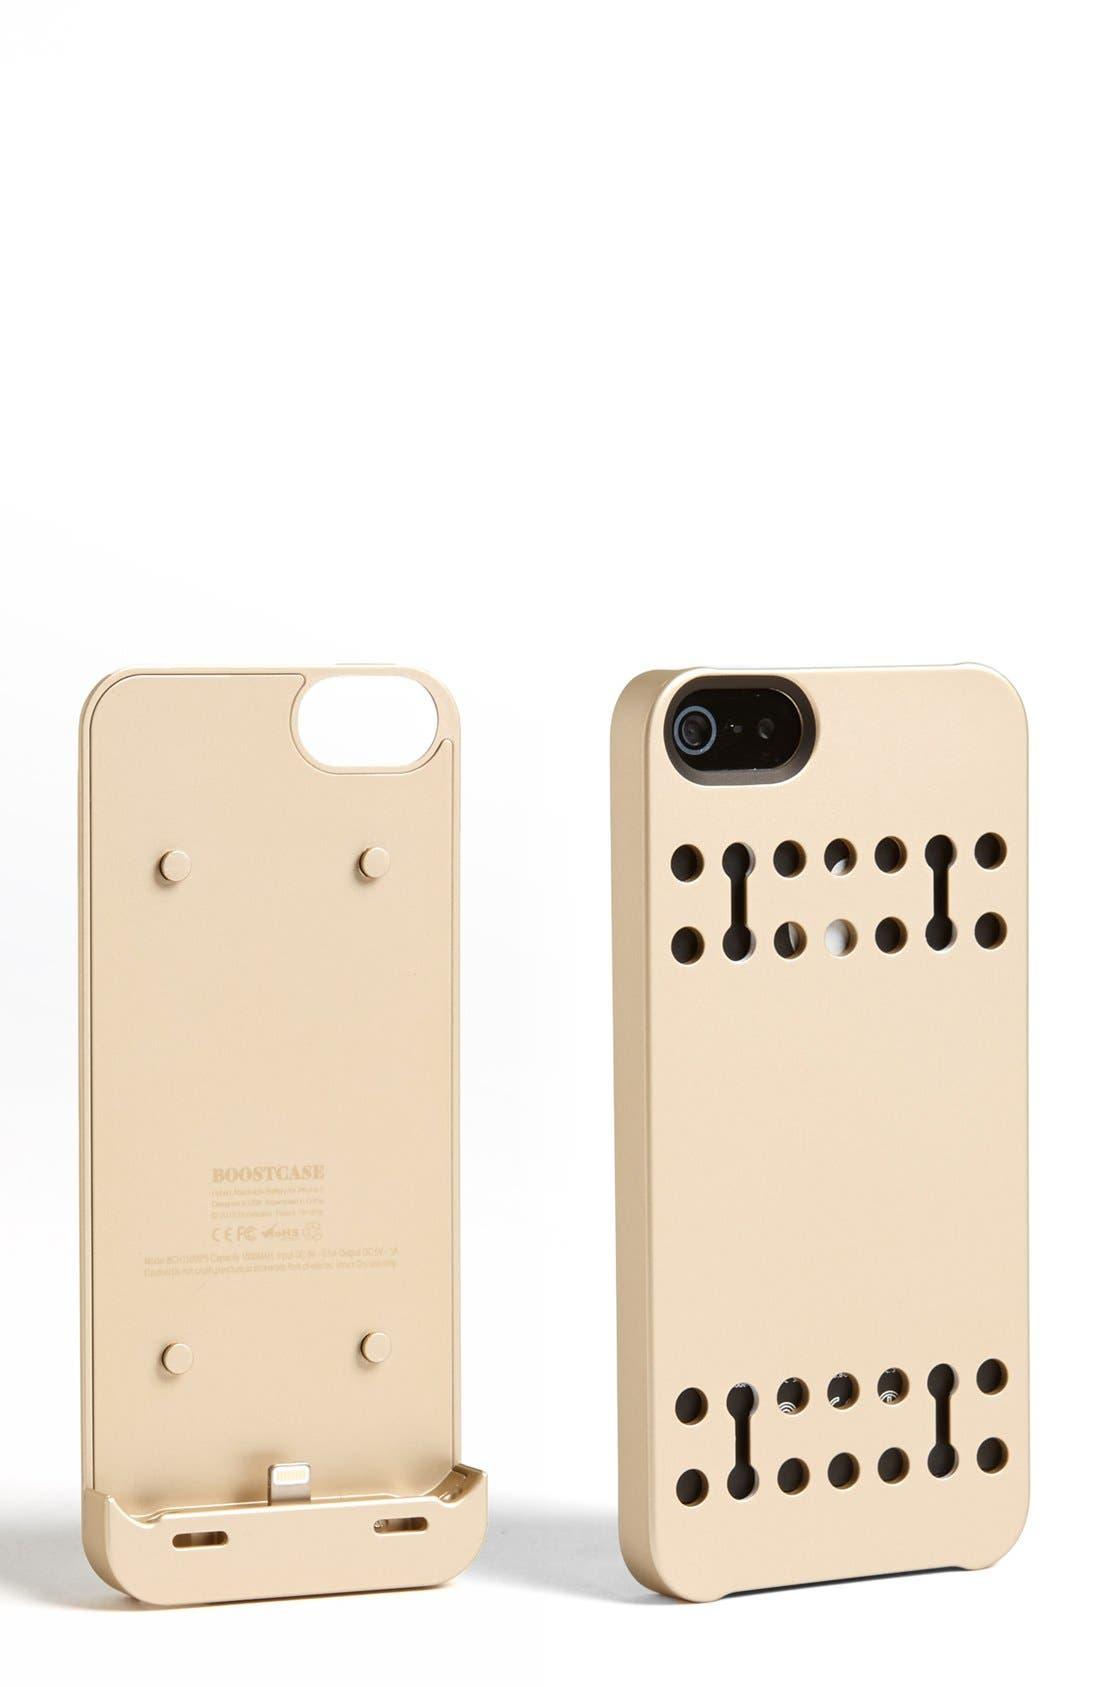 Main Image - Boostcase Hybrid iPhone 5 Battery Case